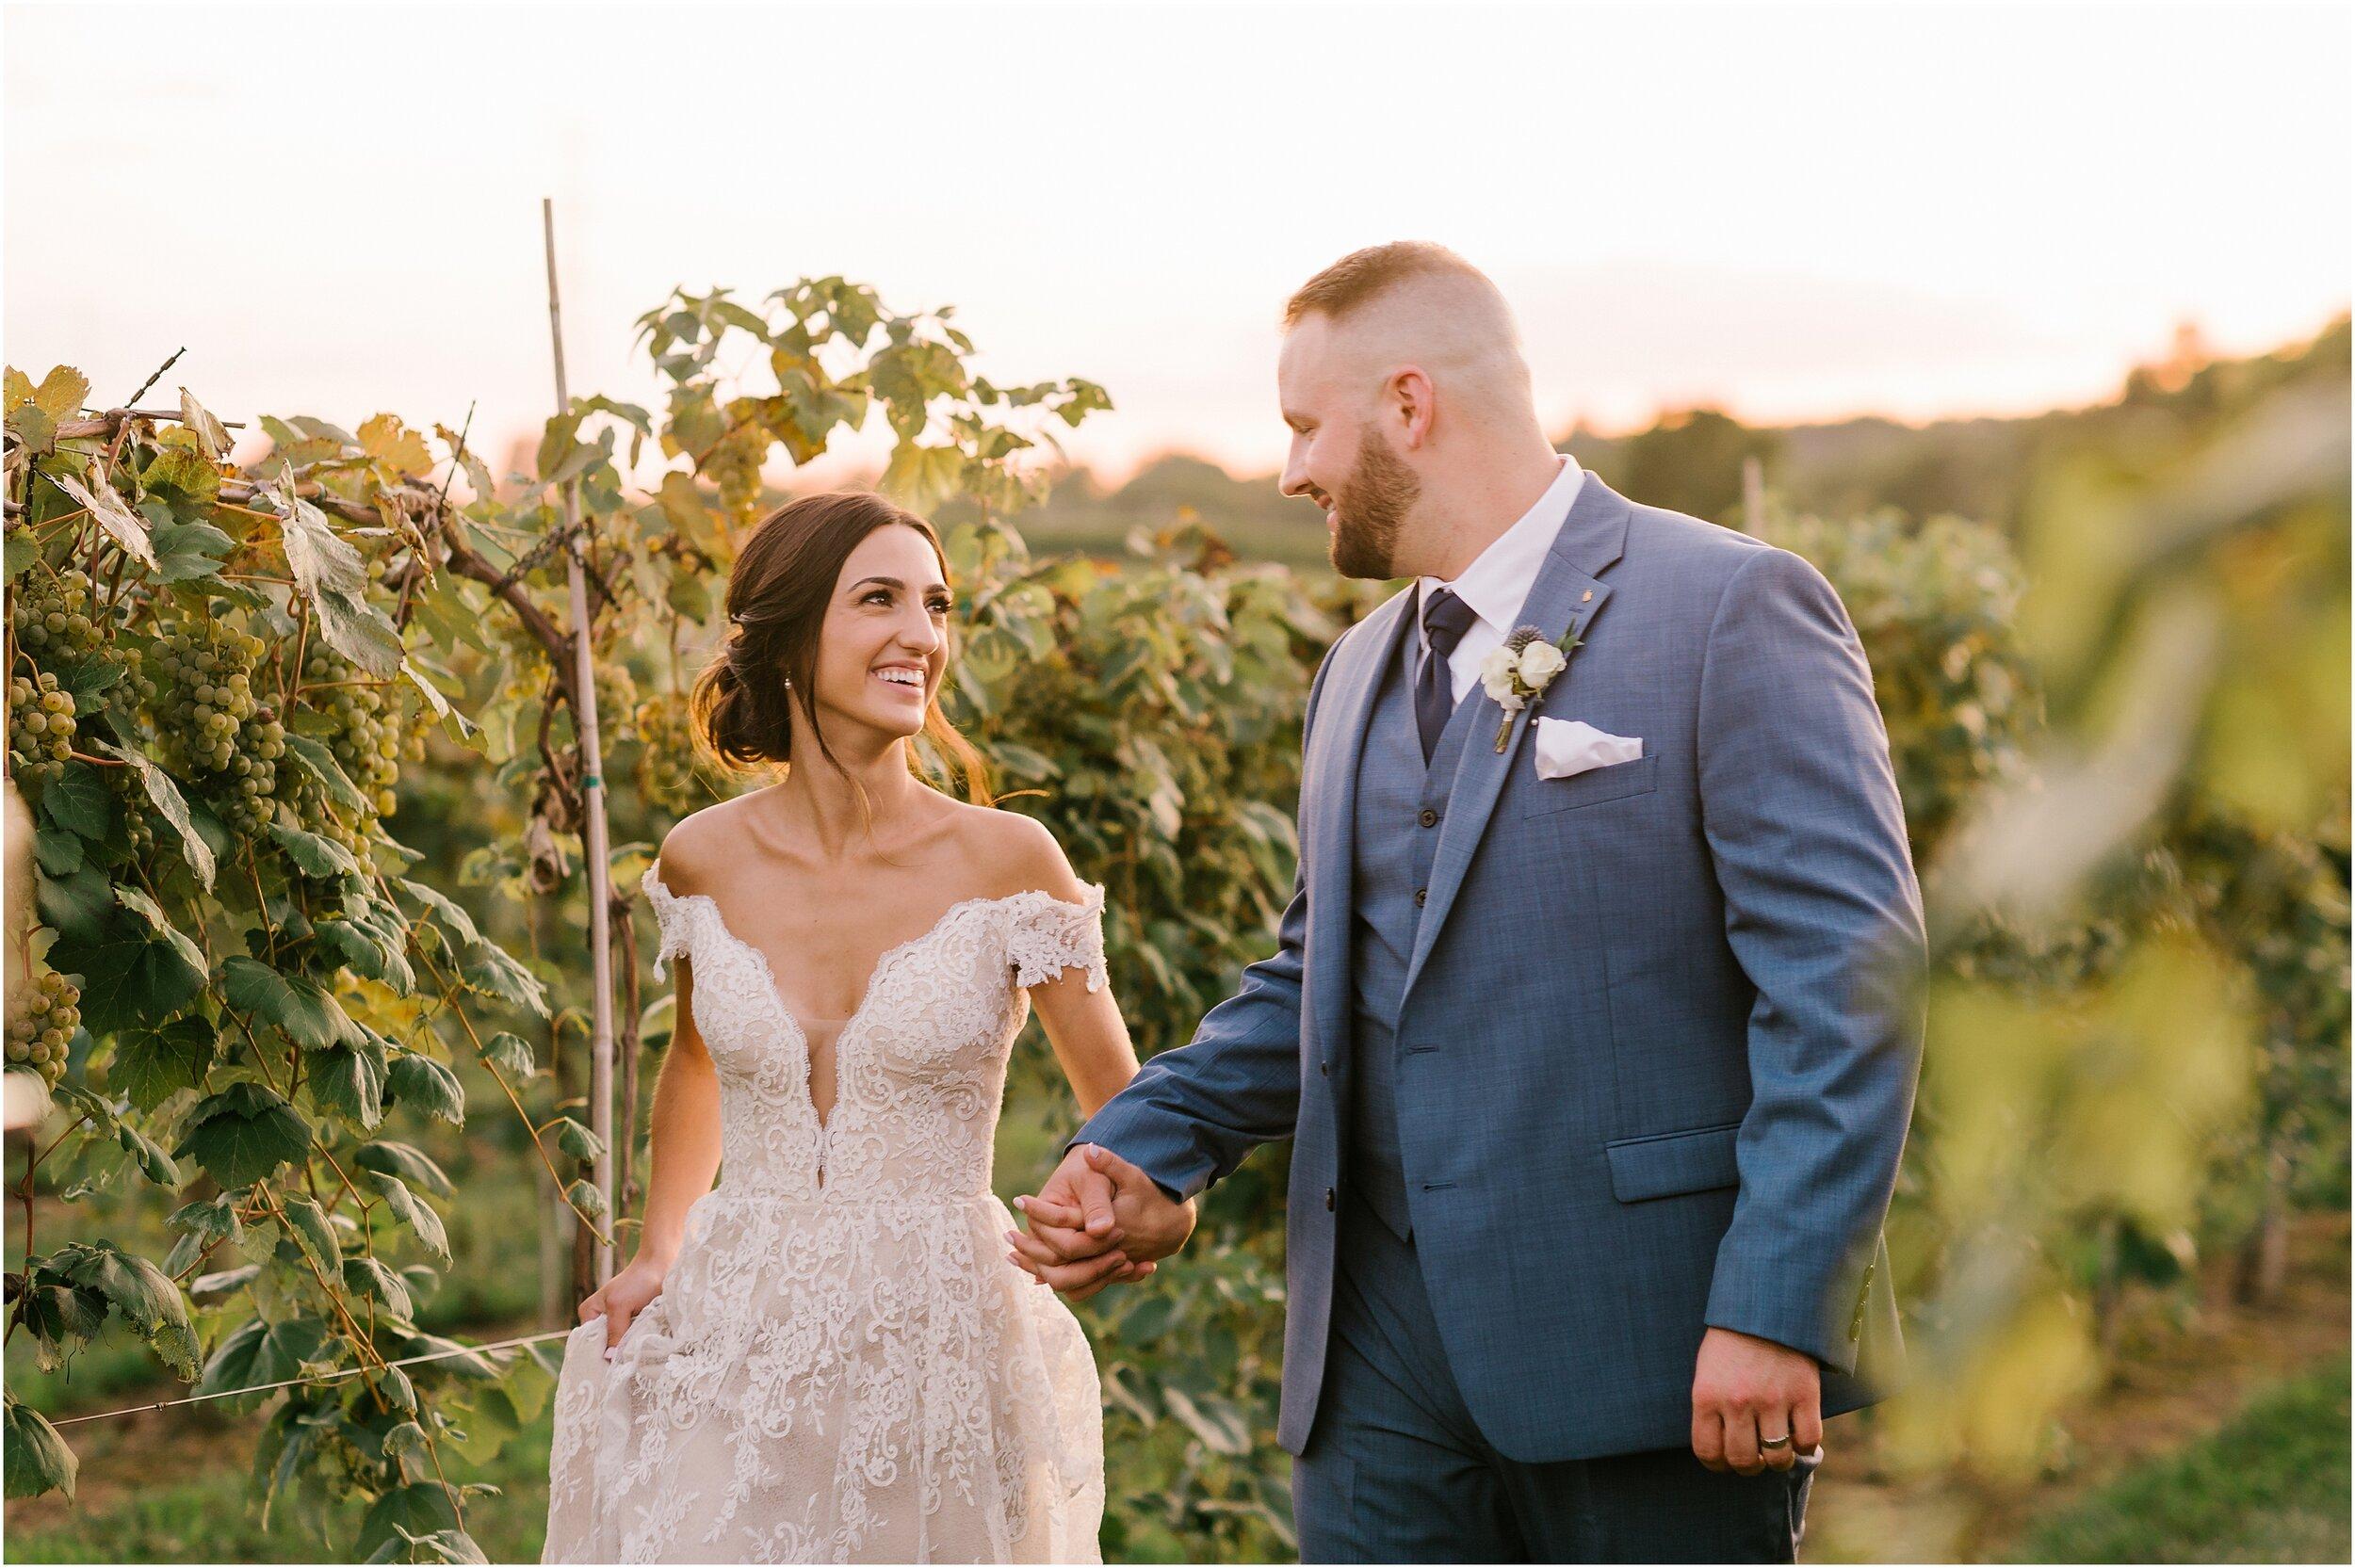 Rebecca Shehorn Photography Indianapolis Wedding Photographer Sycamore at Mallow Run_0786.jpg